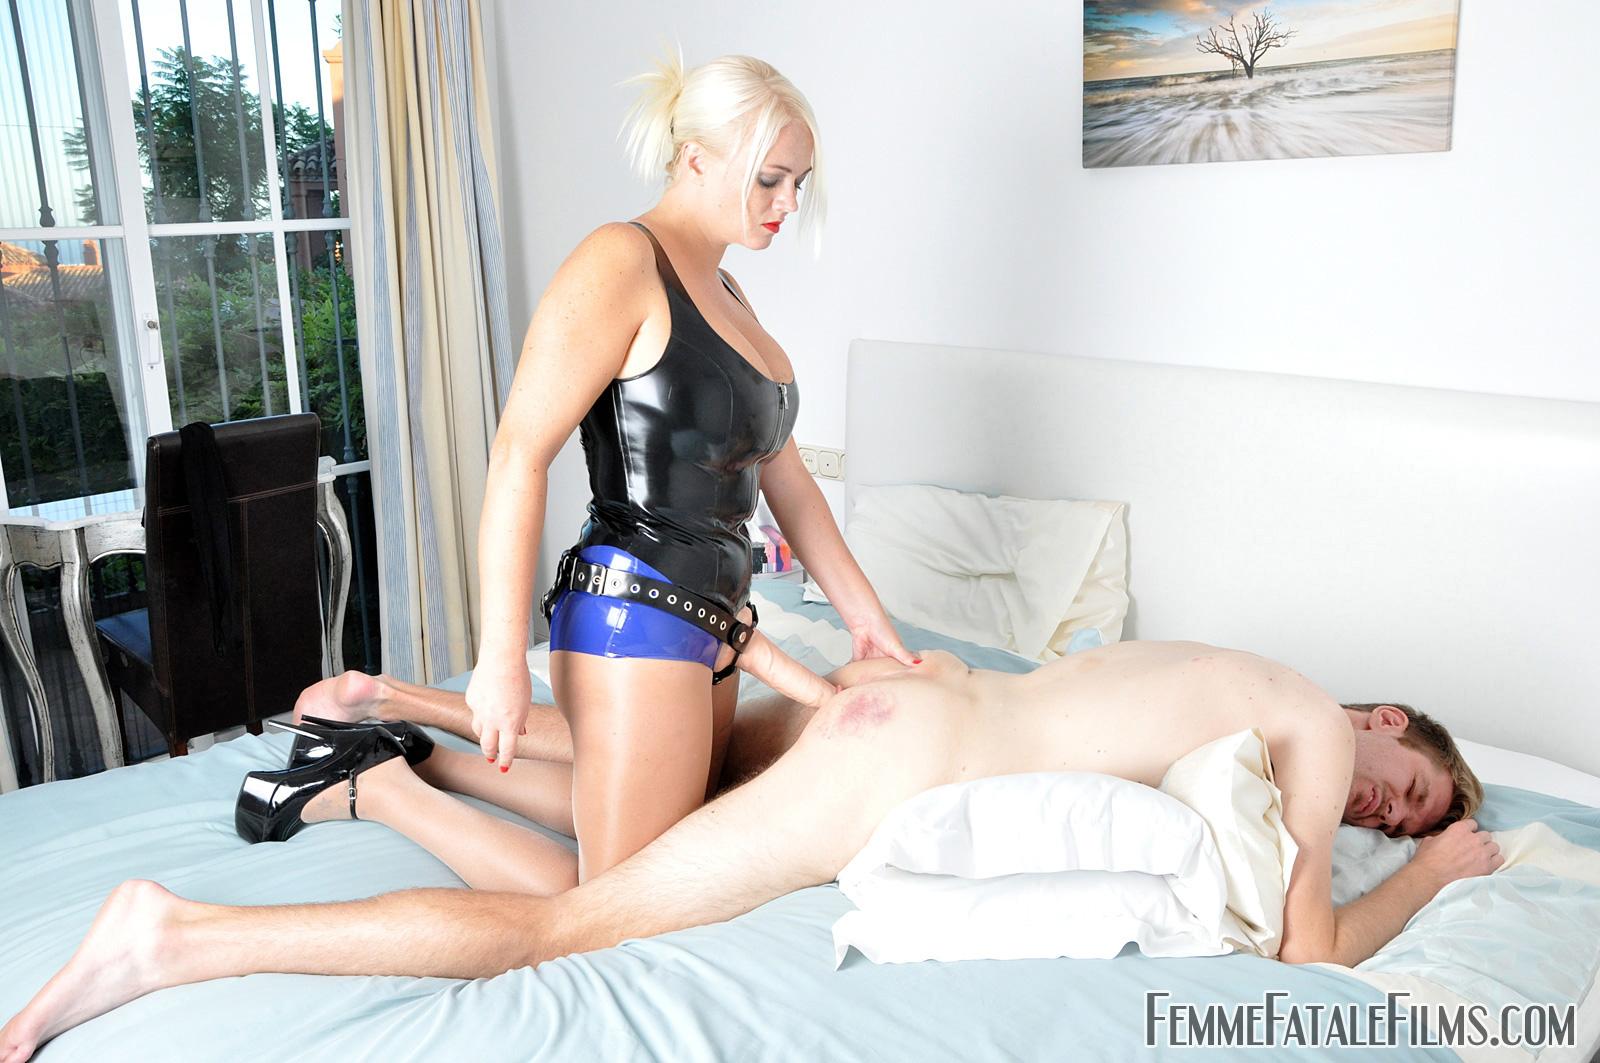 Chastity belt porn download